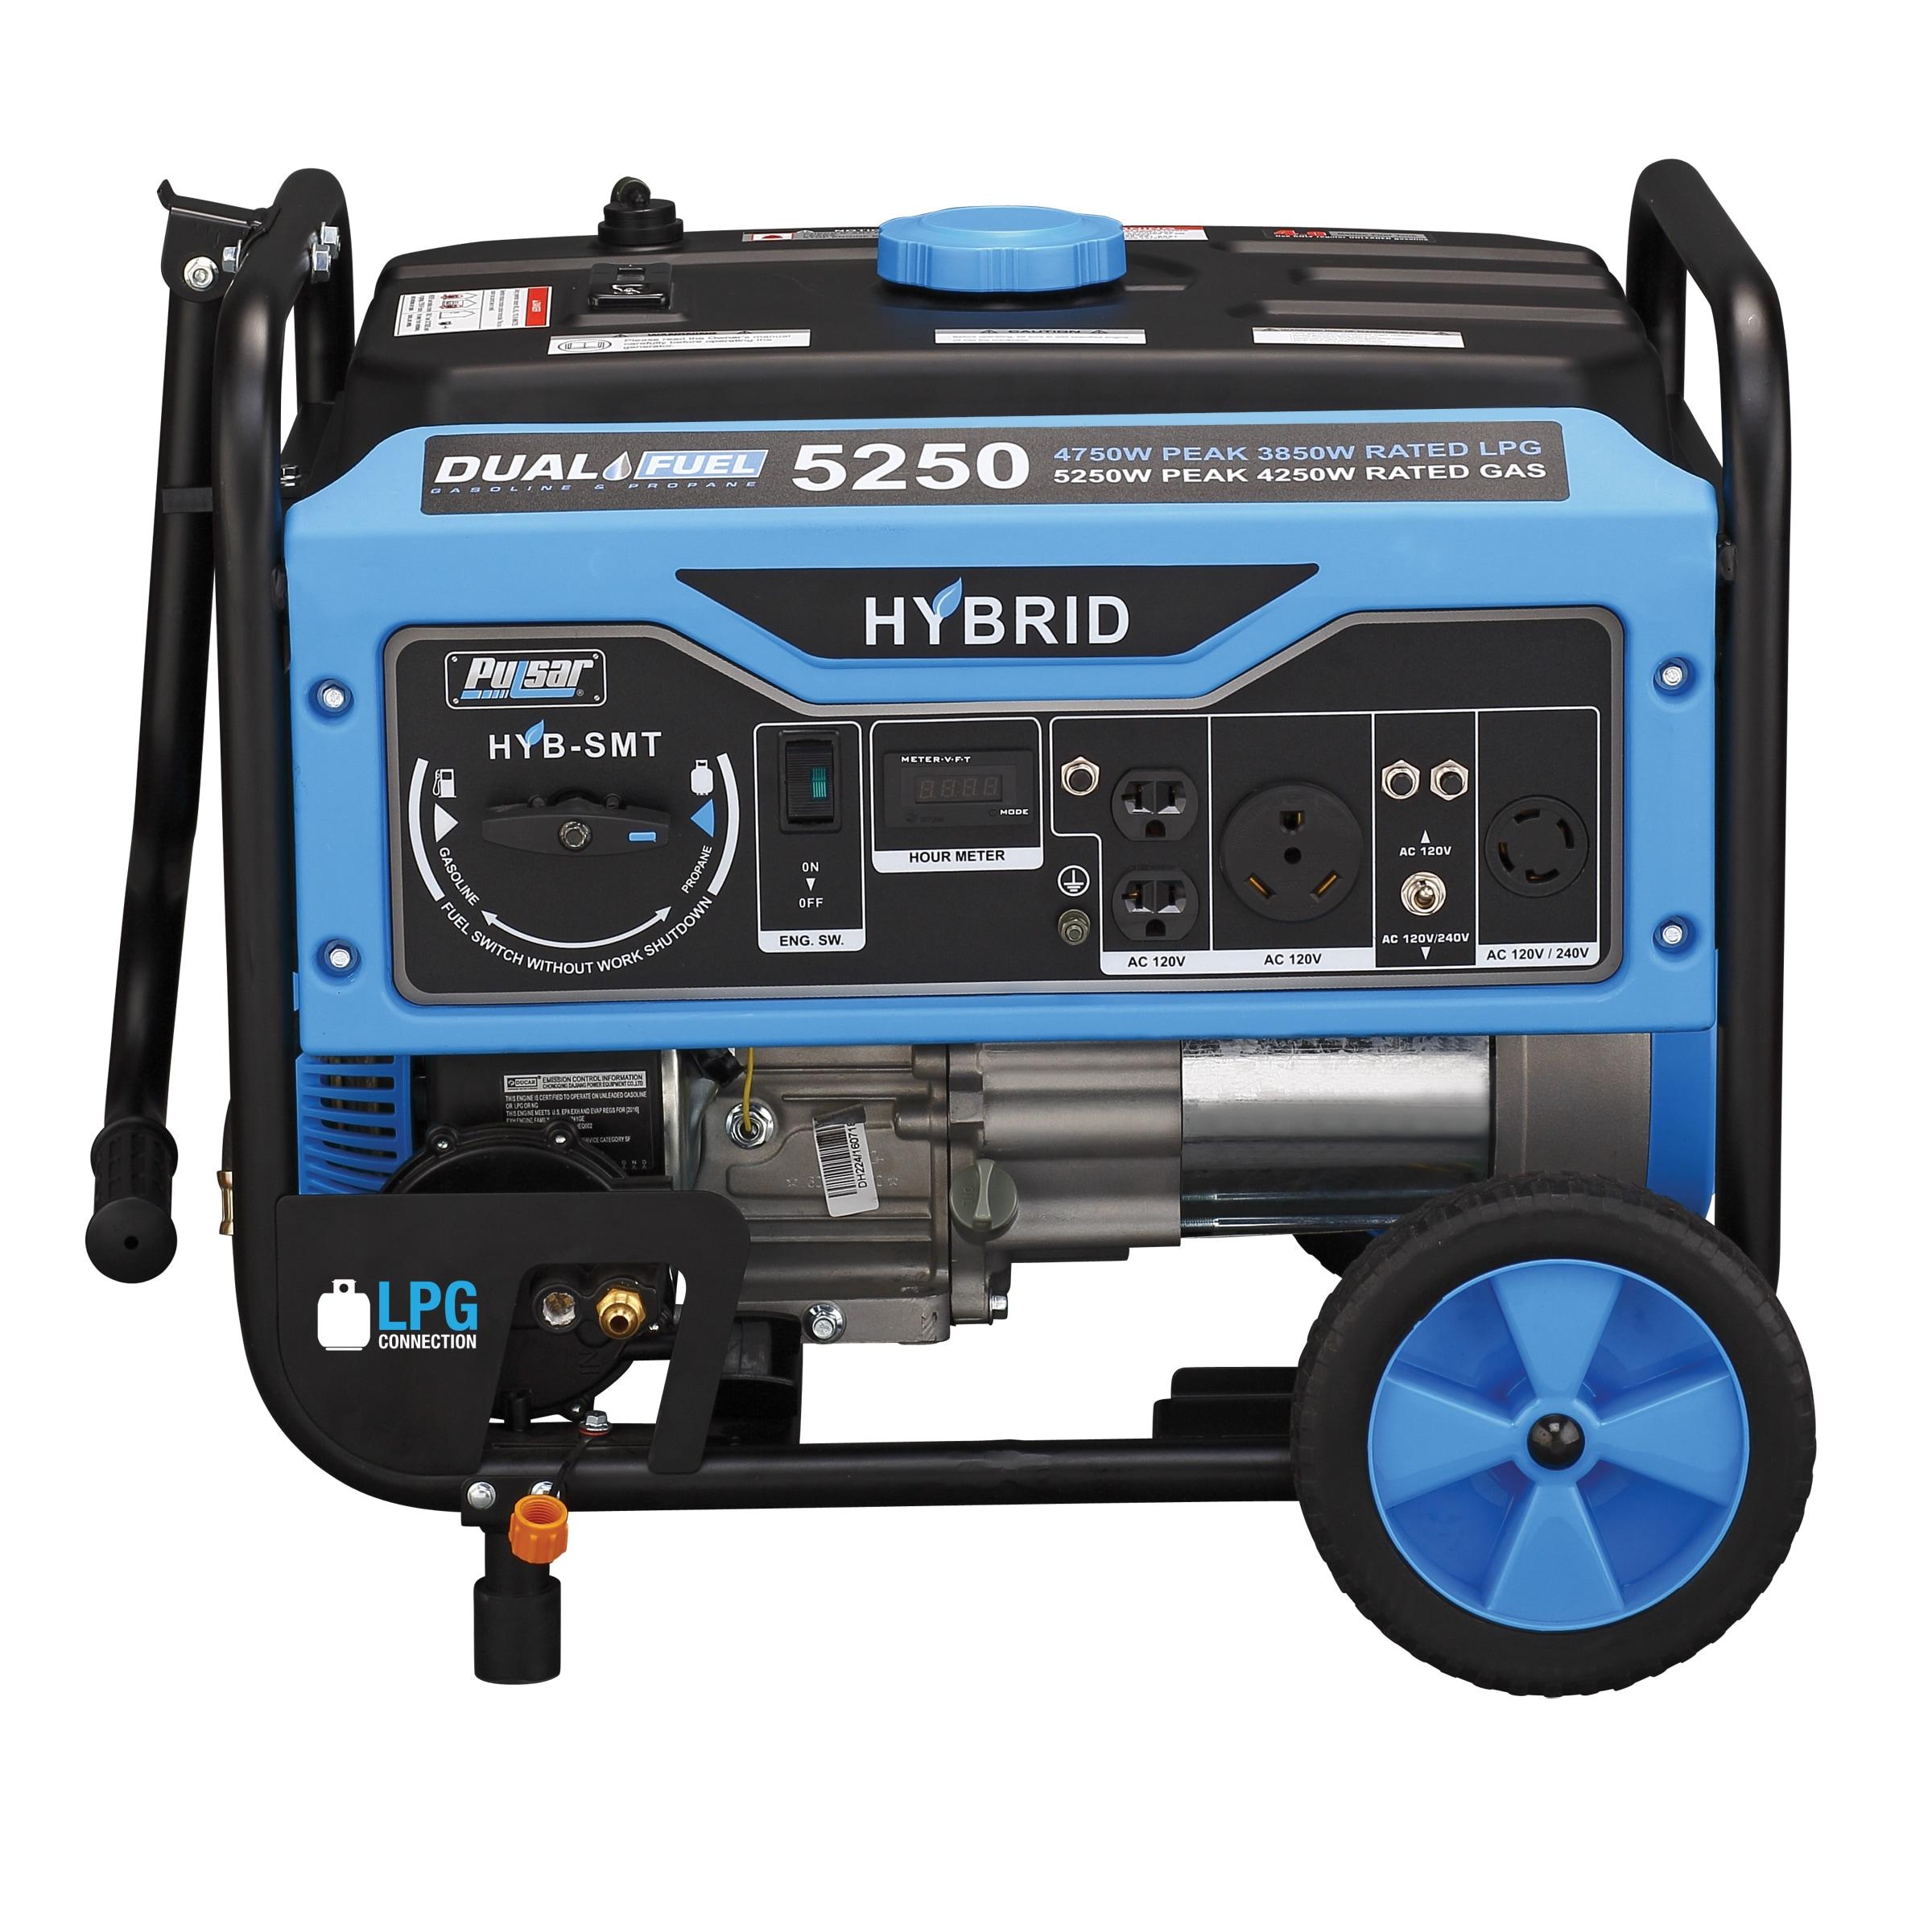 Pulsar 5250 watt Dual Fuel Portable Generator Free Shipping